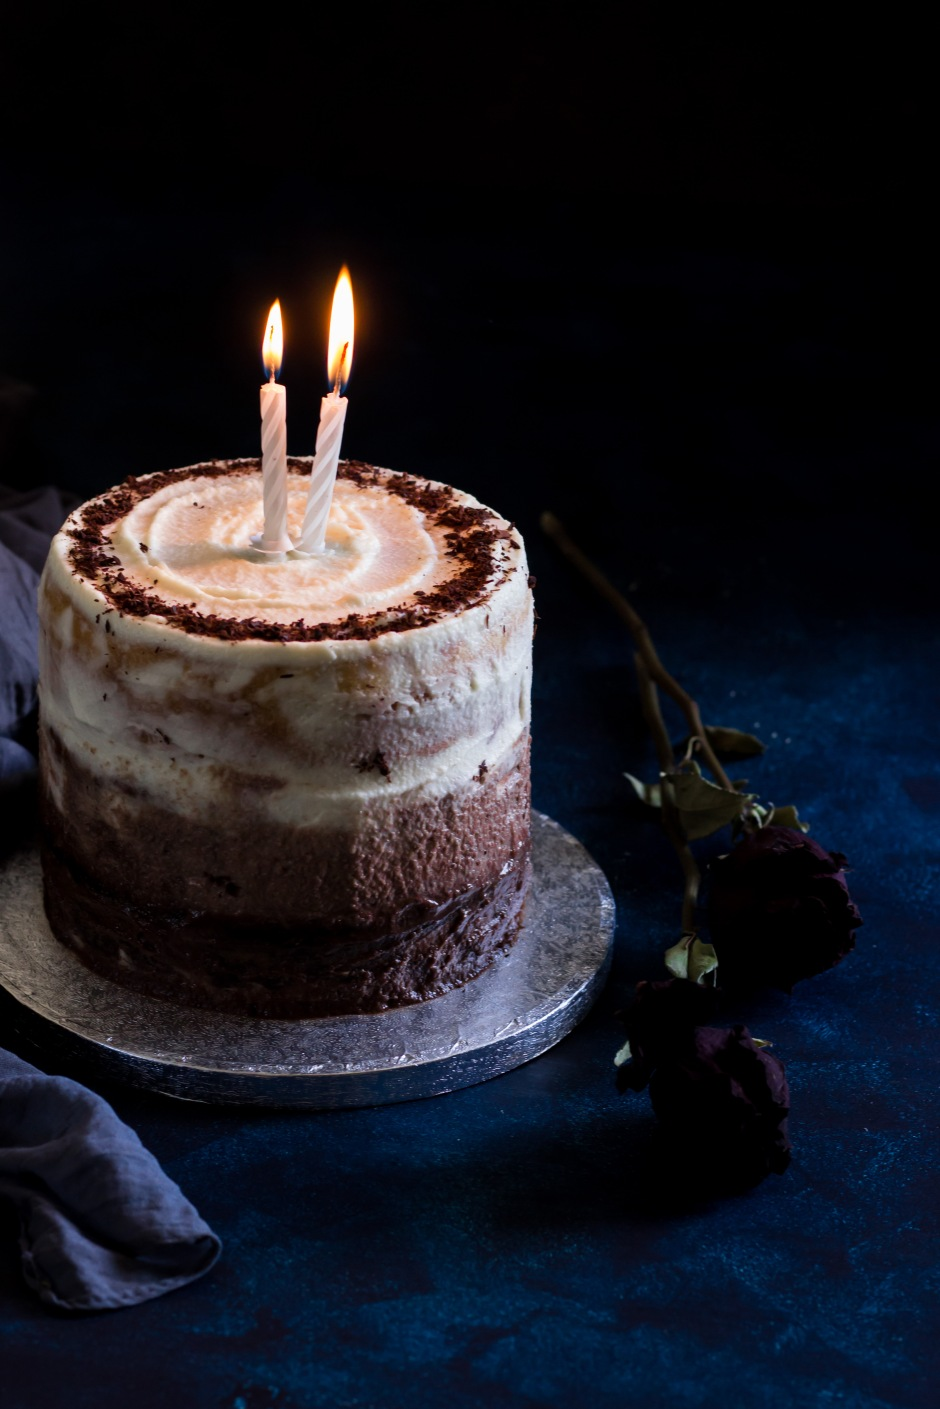 Tiramisu Cake Recipe with Mascarpone Frosting Recipe. Tiramisu Ombre Cake Recipe. Rustic Ombre Cake Recipe. Dark Food Photography. Moody Food Photography. Food Photography. Tiramisu Cake Recipe. Chocolate Cake Recipe. Coffee Cake Recipe. Vanilla Cake Recipe. #cake #foodphotography #tiramisu #coffee #chocolate #vanilla #ombre #recipe #dessert #dessertrecipes #food